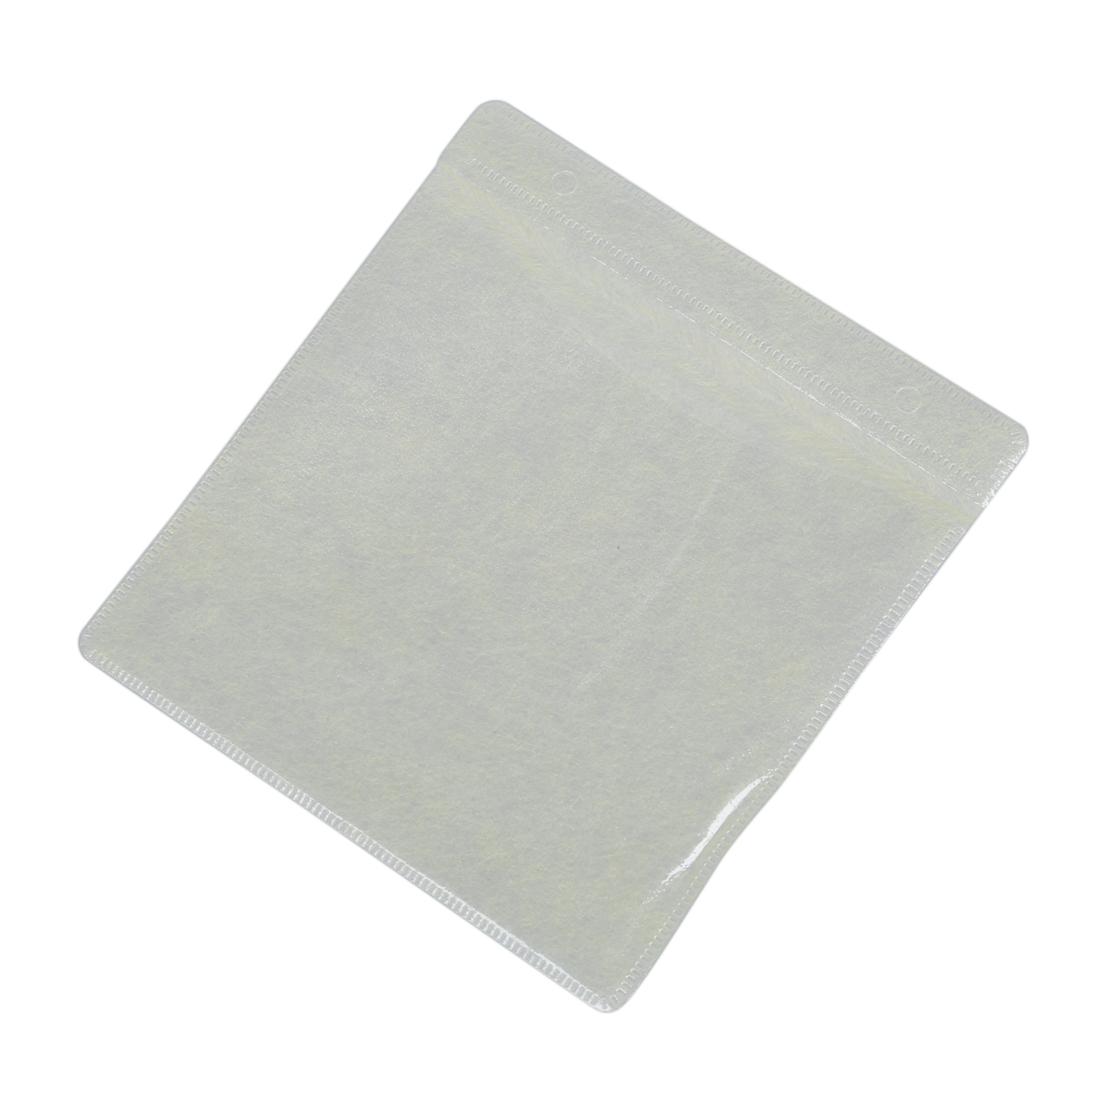 100x Cd Dvd Plastic Sleeve Tssc Cover Storage Case Wallet